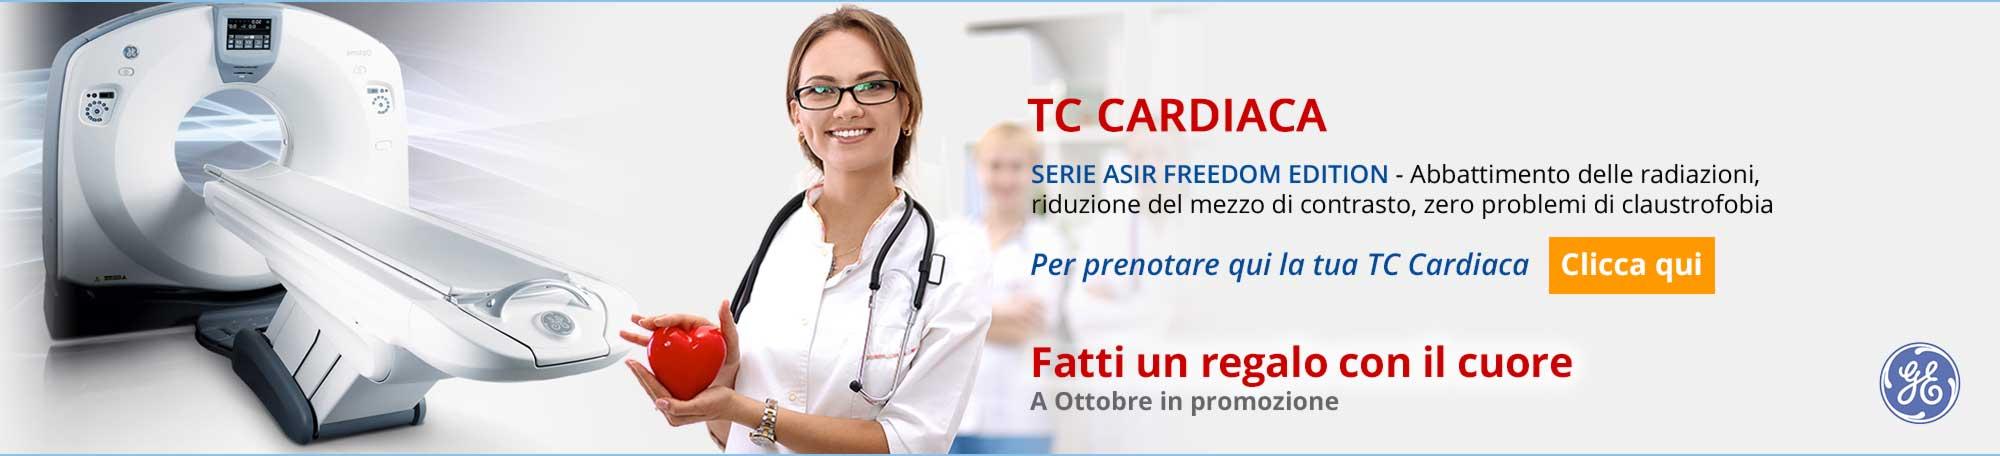 TC-Cardiaca Ostia